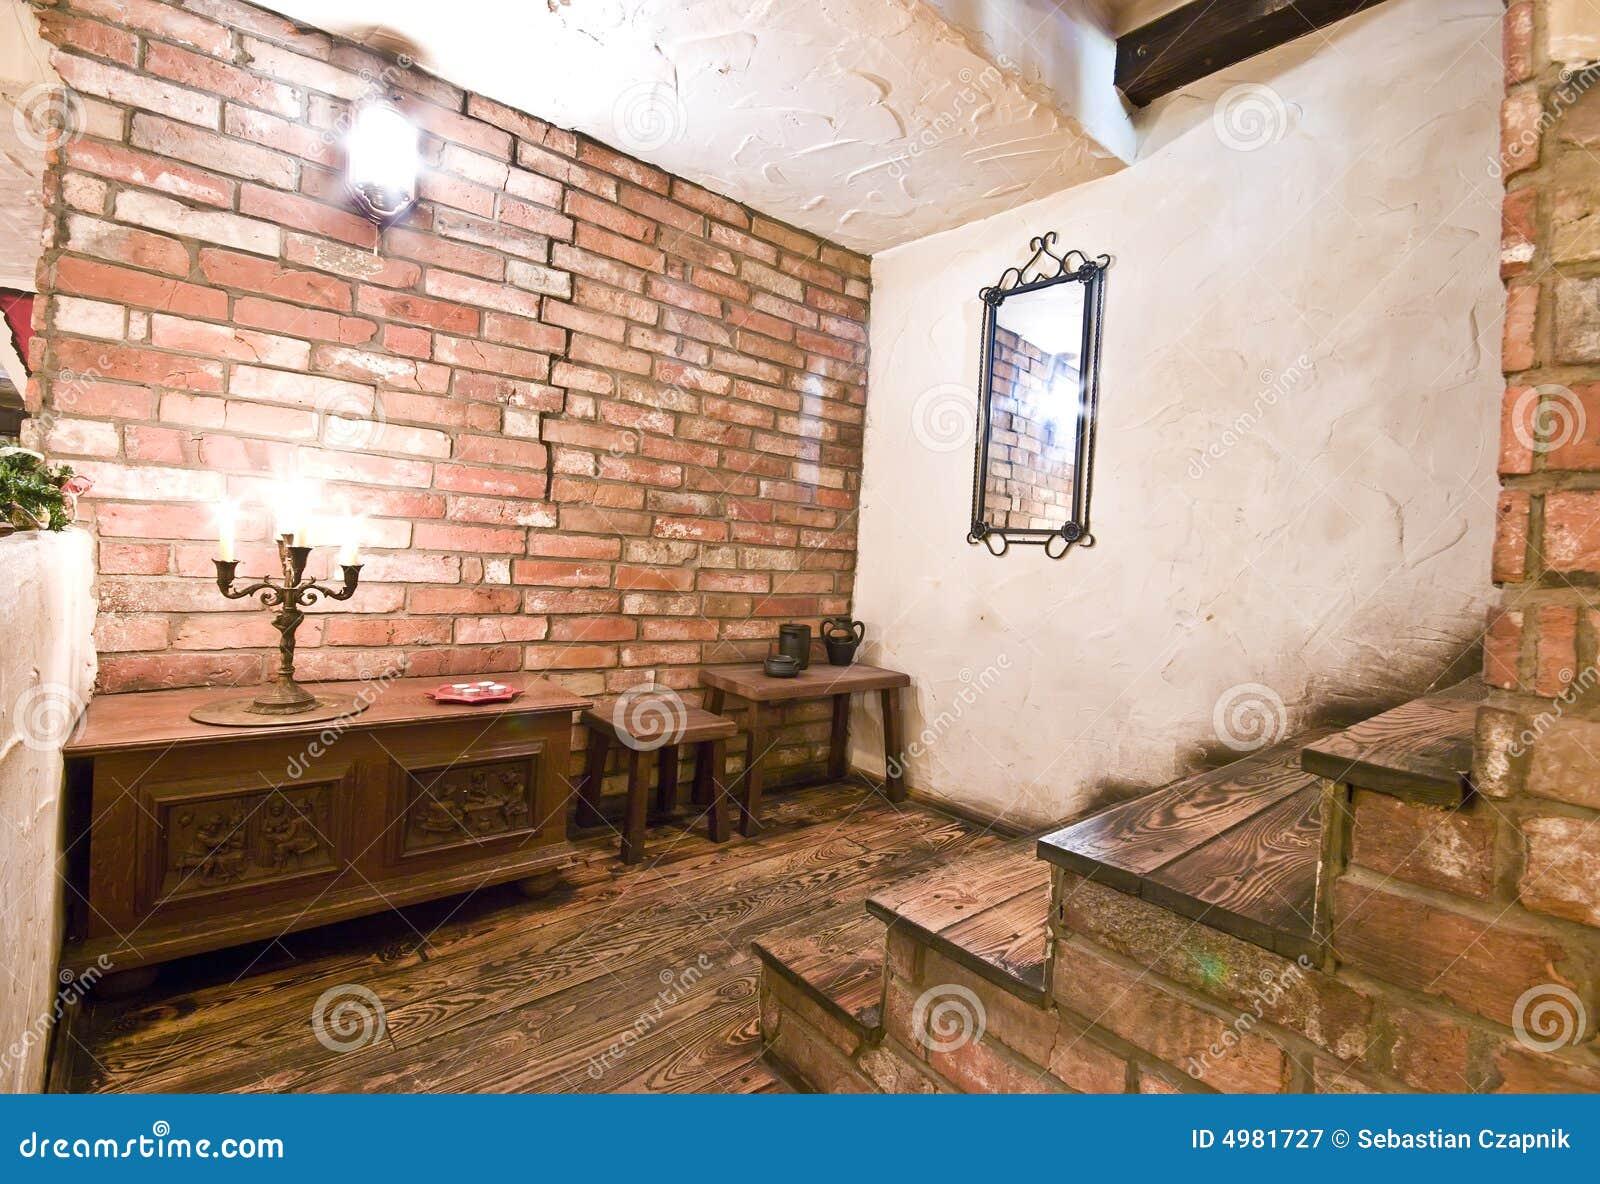 Escaleras interiores r sticas fotograf a de archivo libre - Paredes rusticas interiores ...